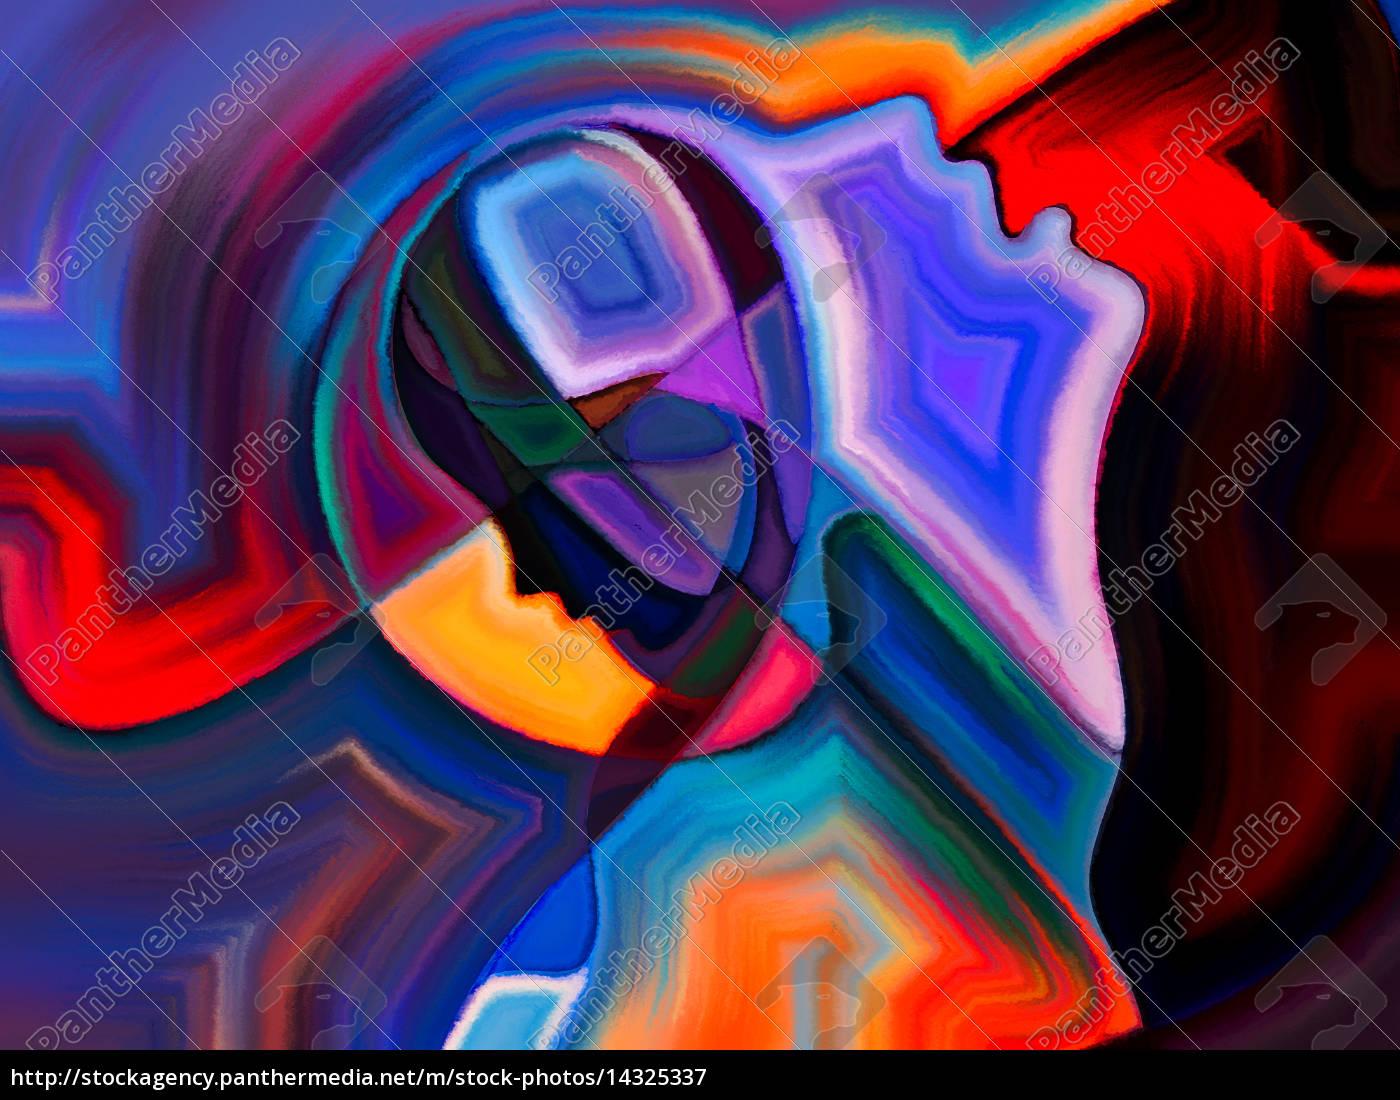 advance, of, sacred, hues - 14325337